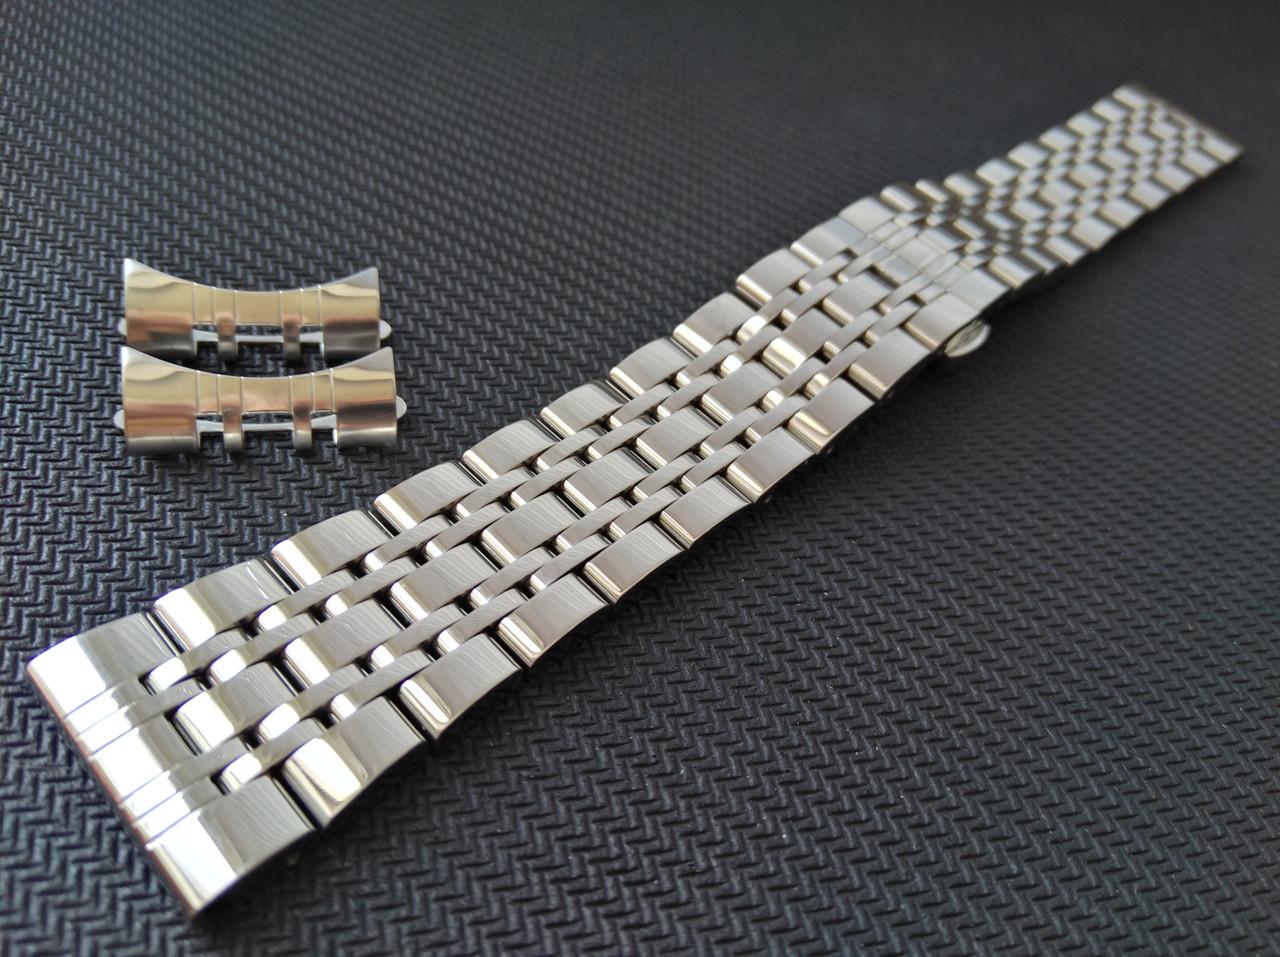 Браслет для годинника з нержавіючої сталі 316L, литий, глянець. Пряме /заокруглене закінчення. 20 мм